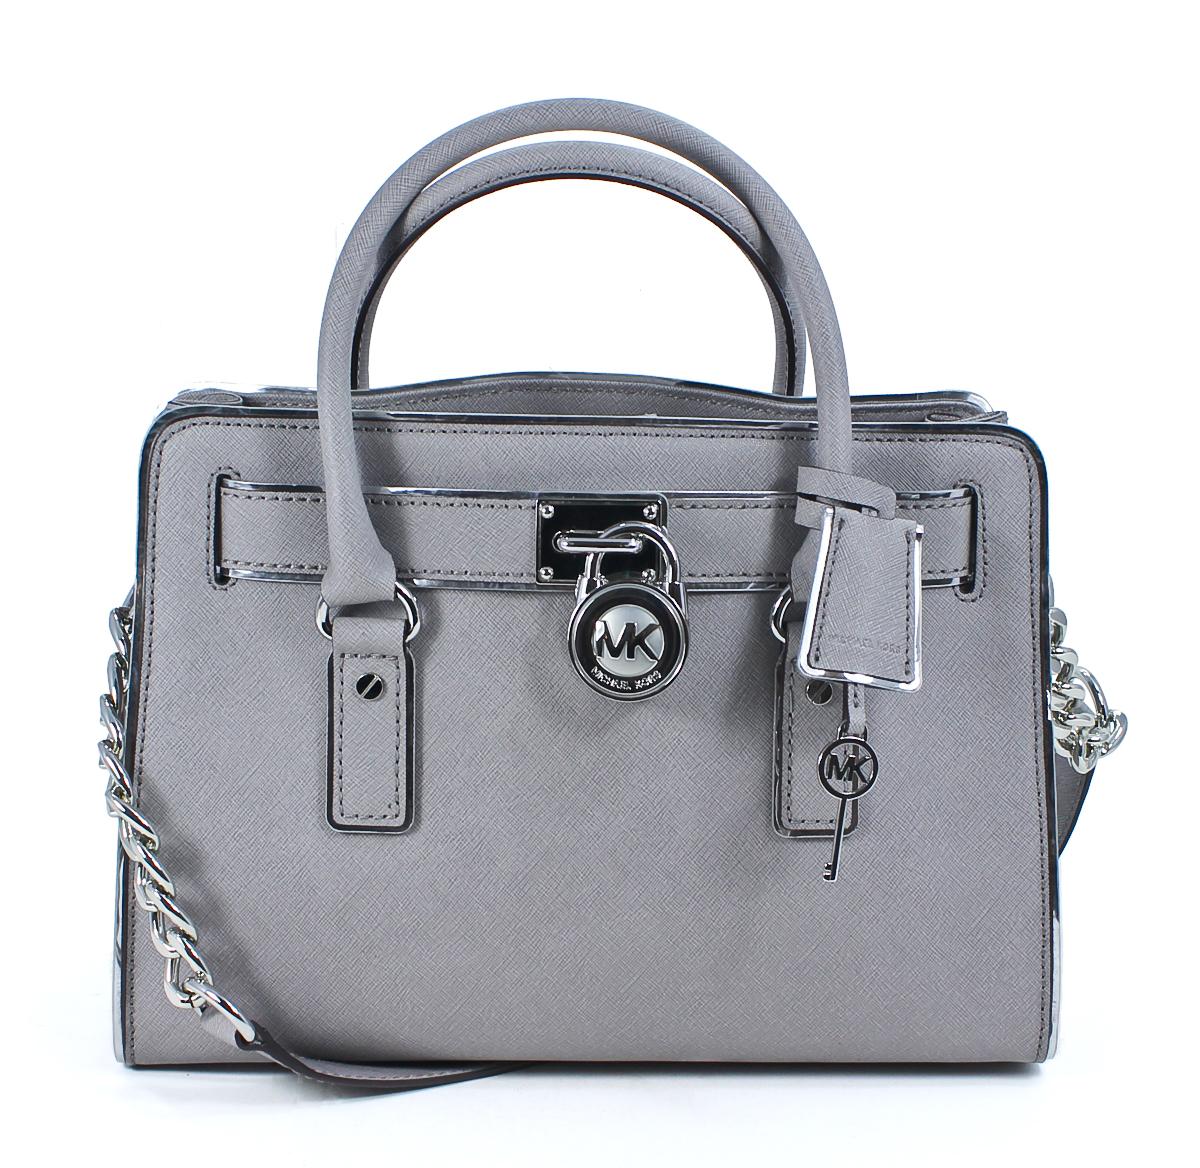 Michael-Kors-Hamilton-Specchio-East-West-Satchel-Pearl-Grey-Leather-Handbag-New